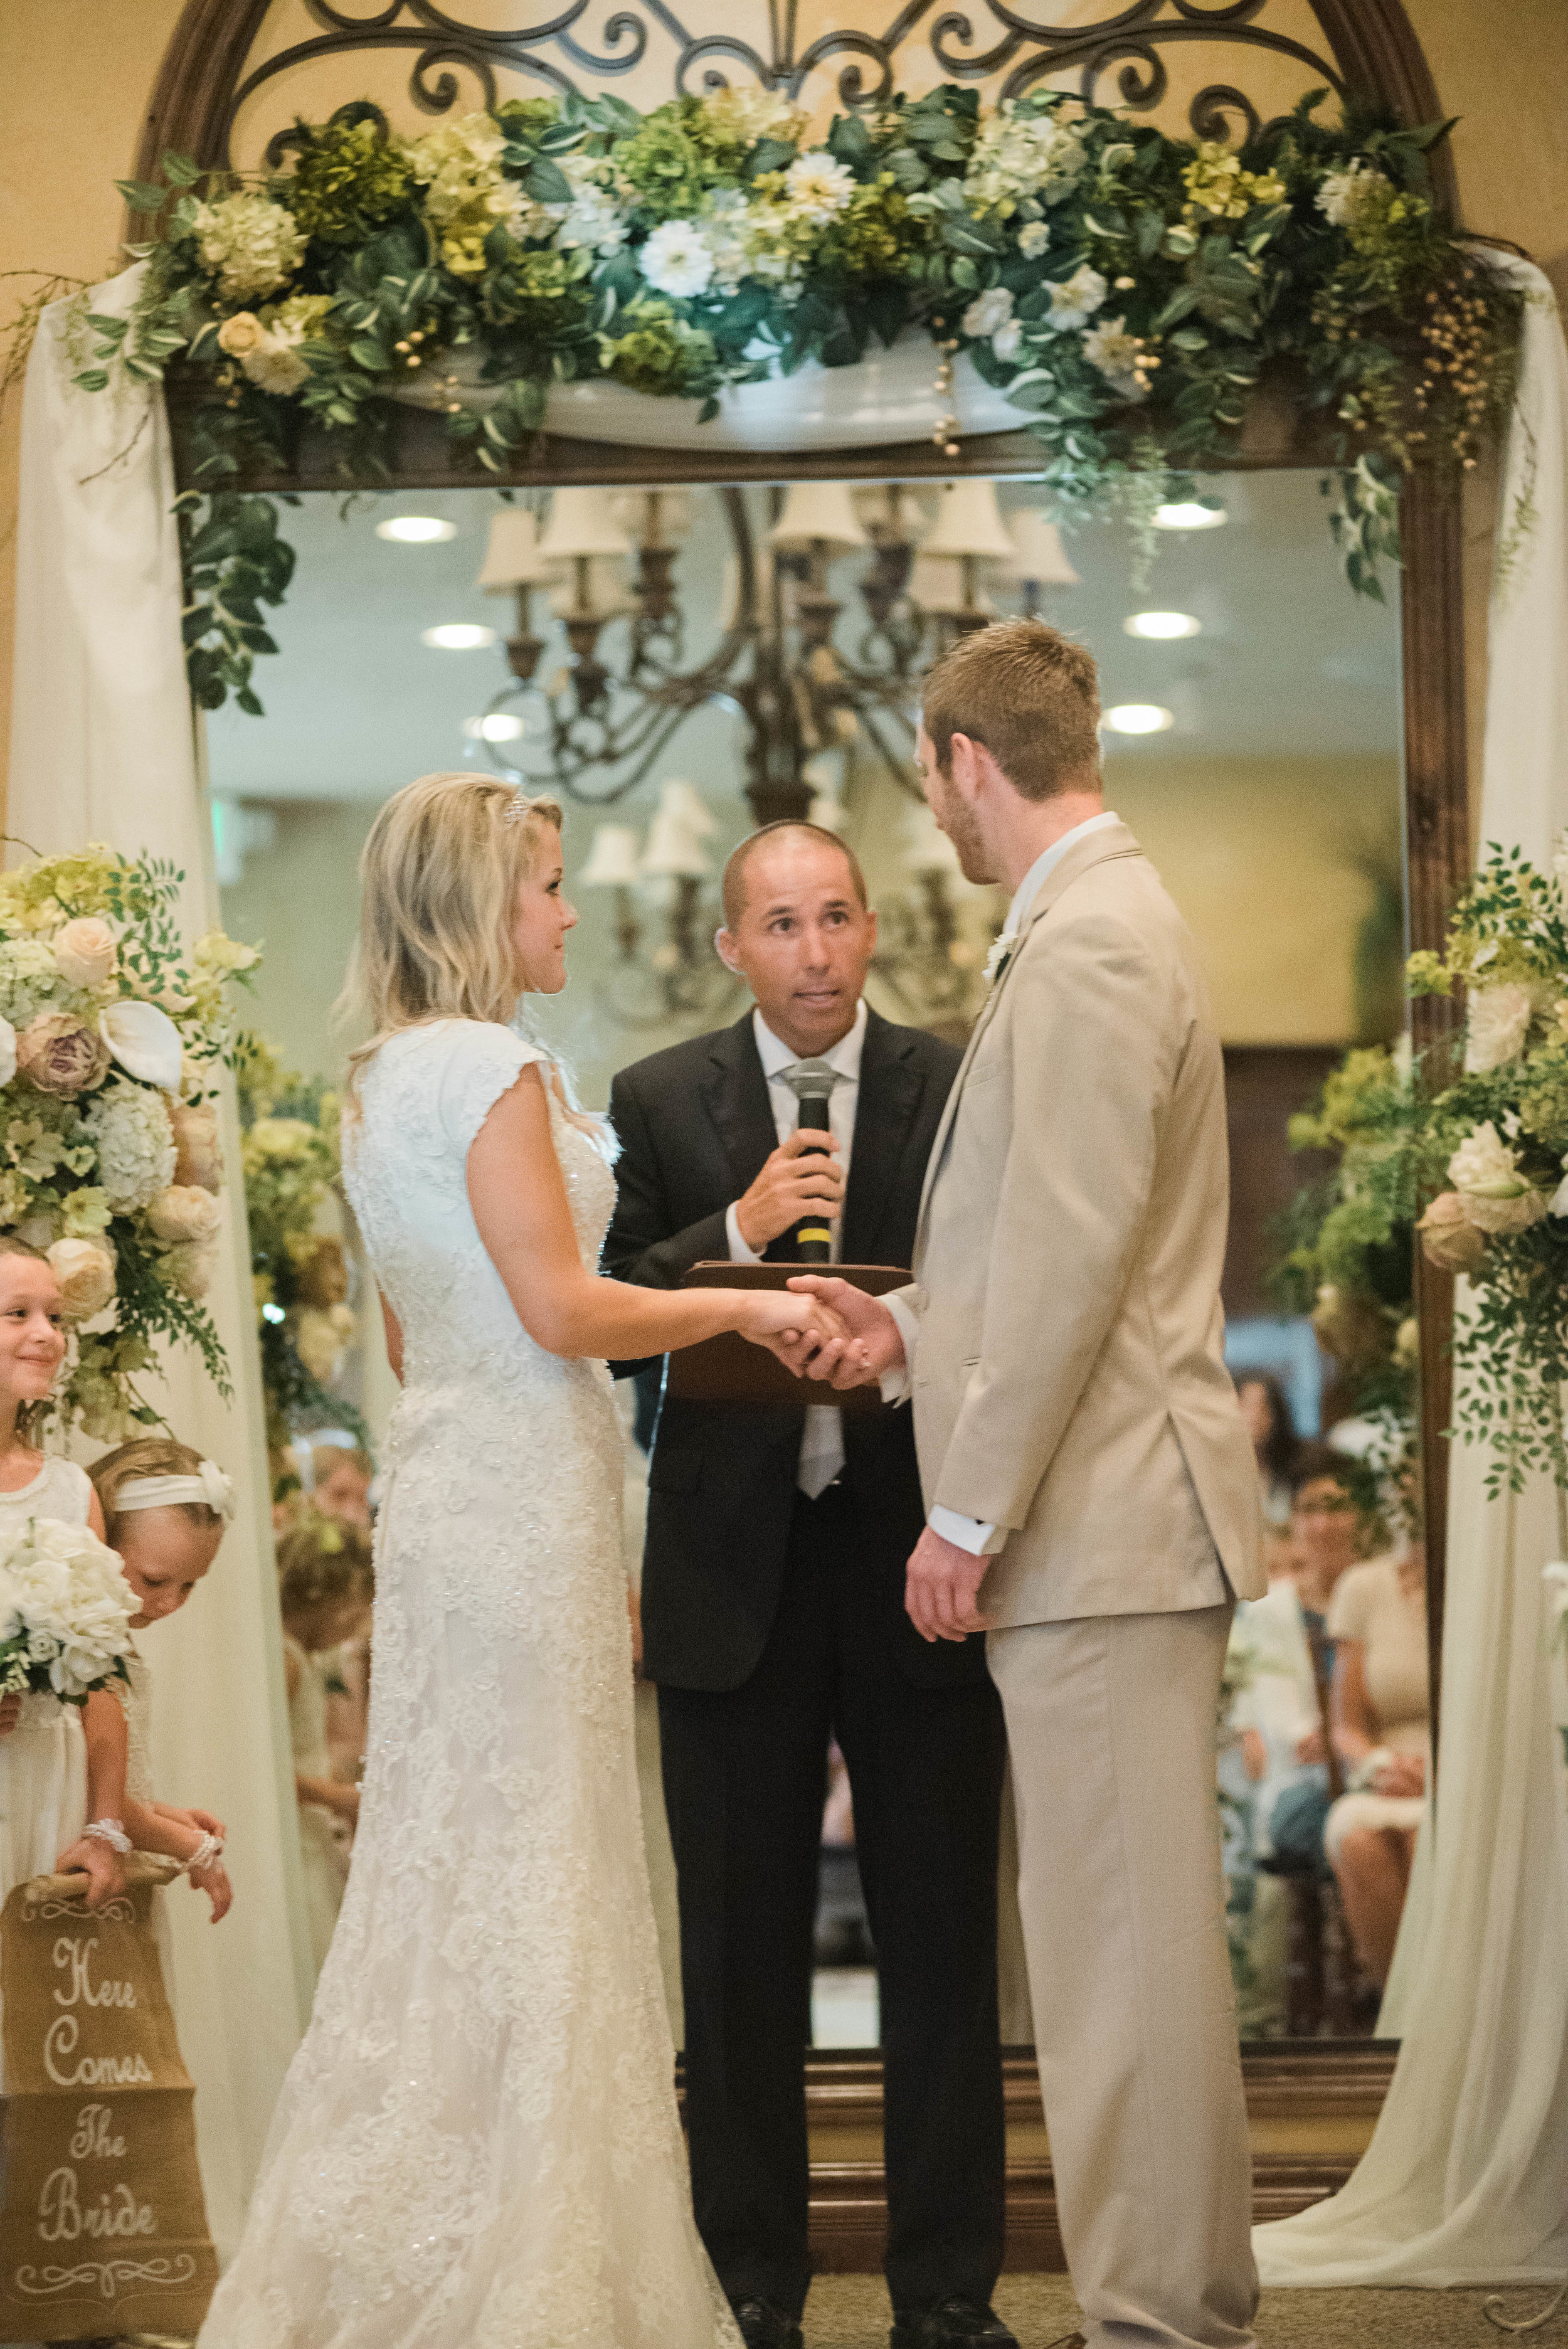 DANIEL+LACI-WEDDING-Sadie_Banks_Photography-189.jpg